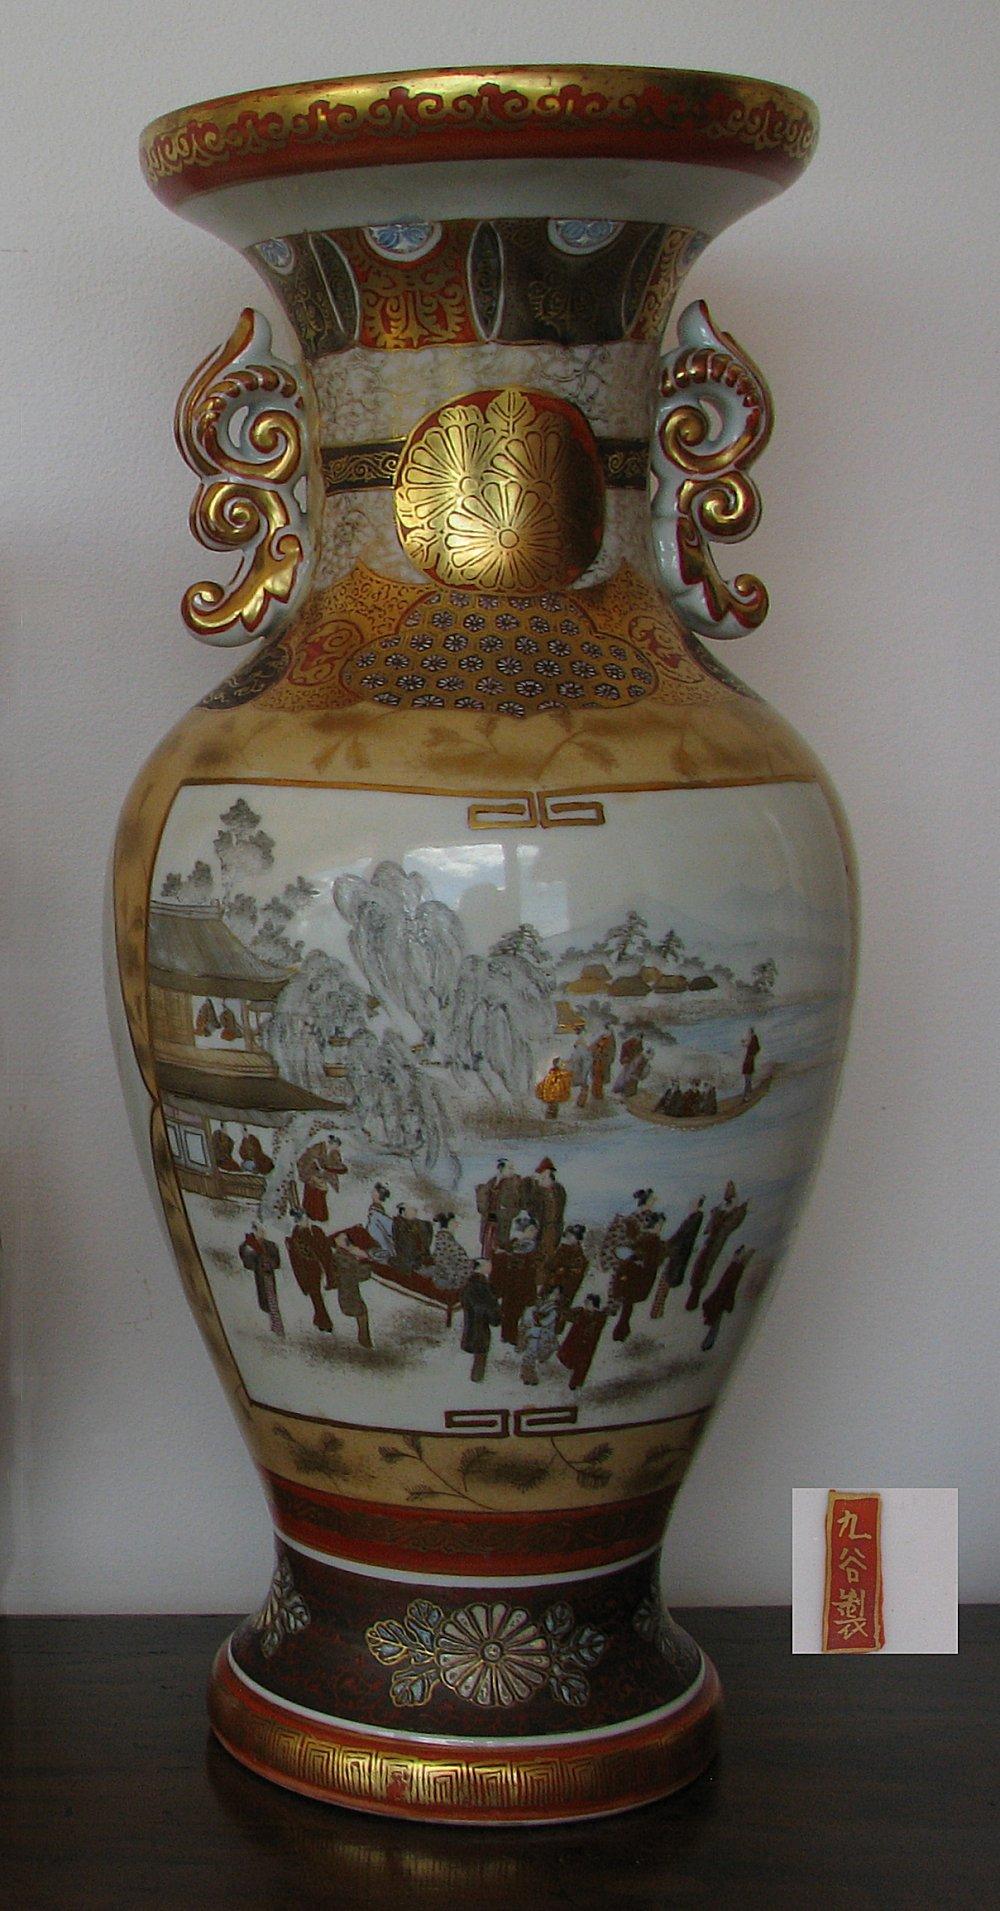 Kutani vase mark kutani sei meiji 1868 1913 period probably around 1880 height 30 cm reviewsmspy